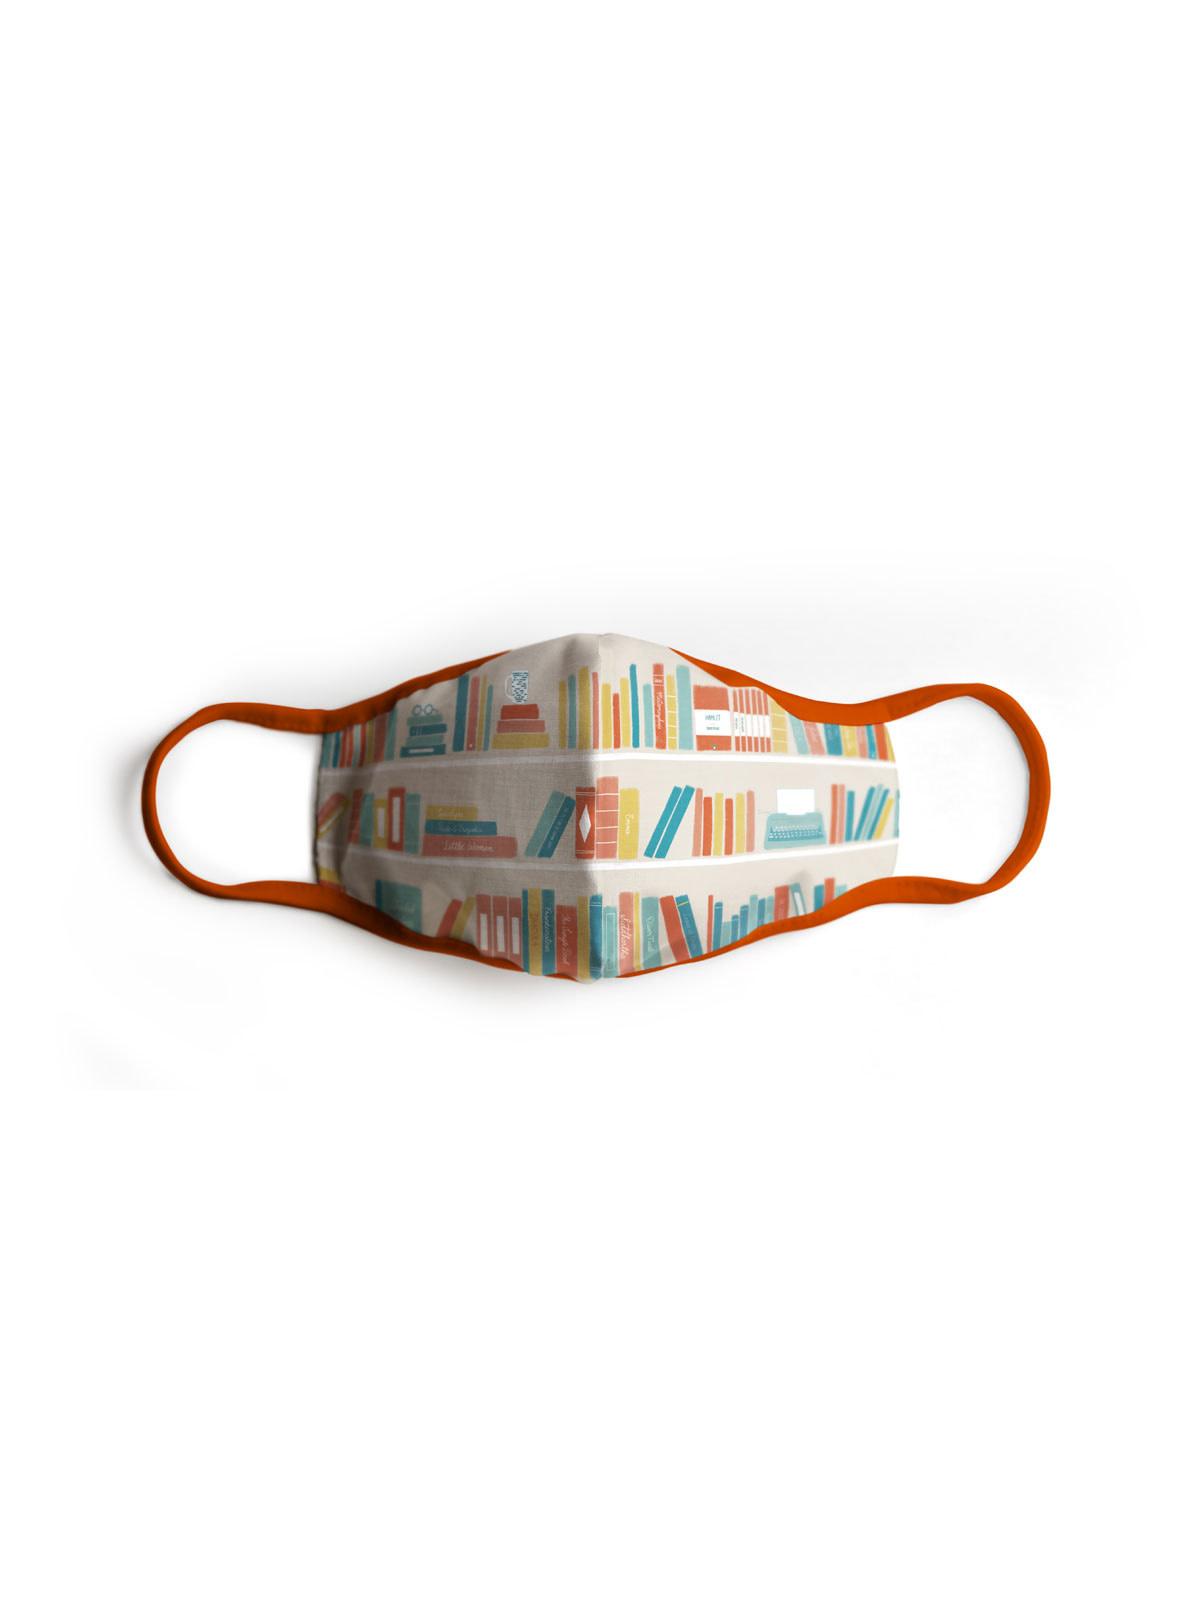 Bookshelf Face Mask